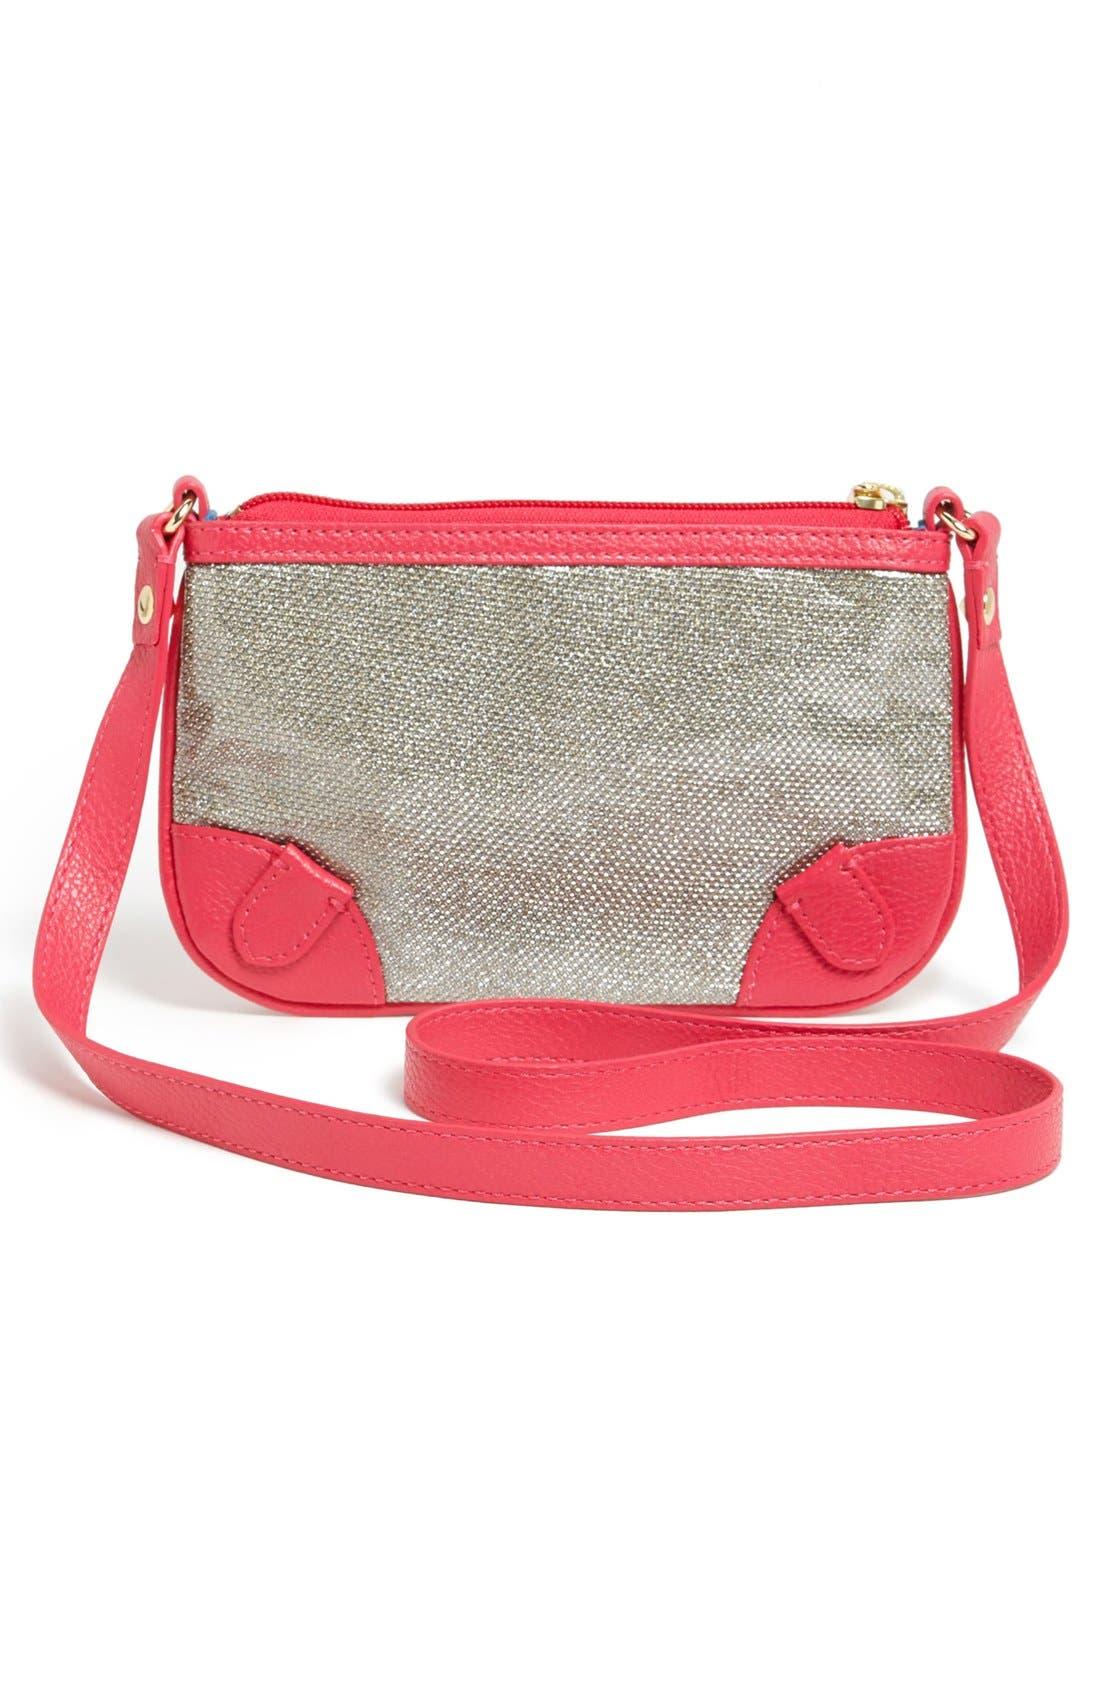 Alternate Image 4  - Juicy Couture 'Bright Diamond' Crossbody Bag (Girls)